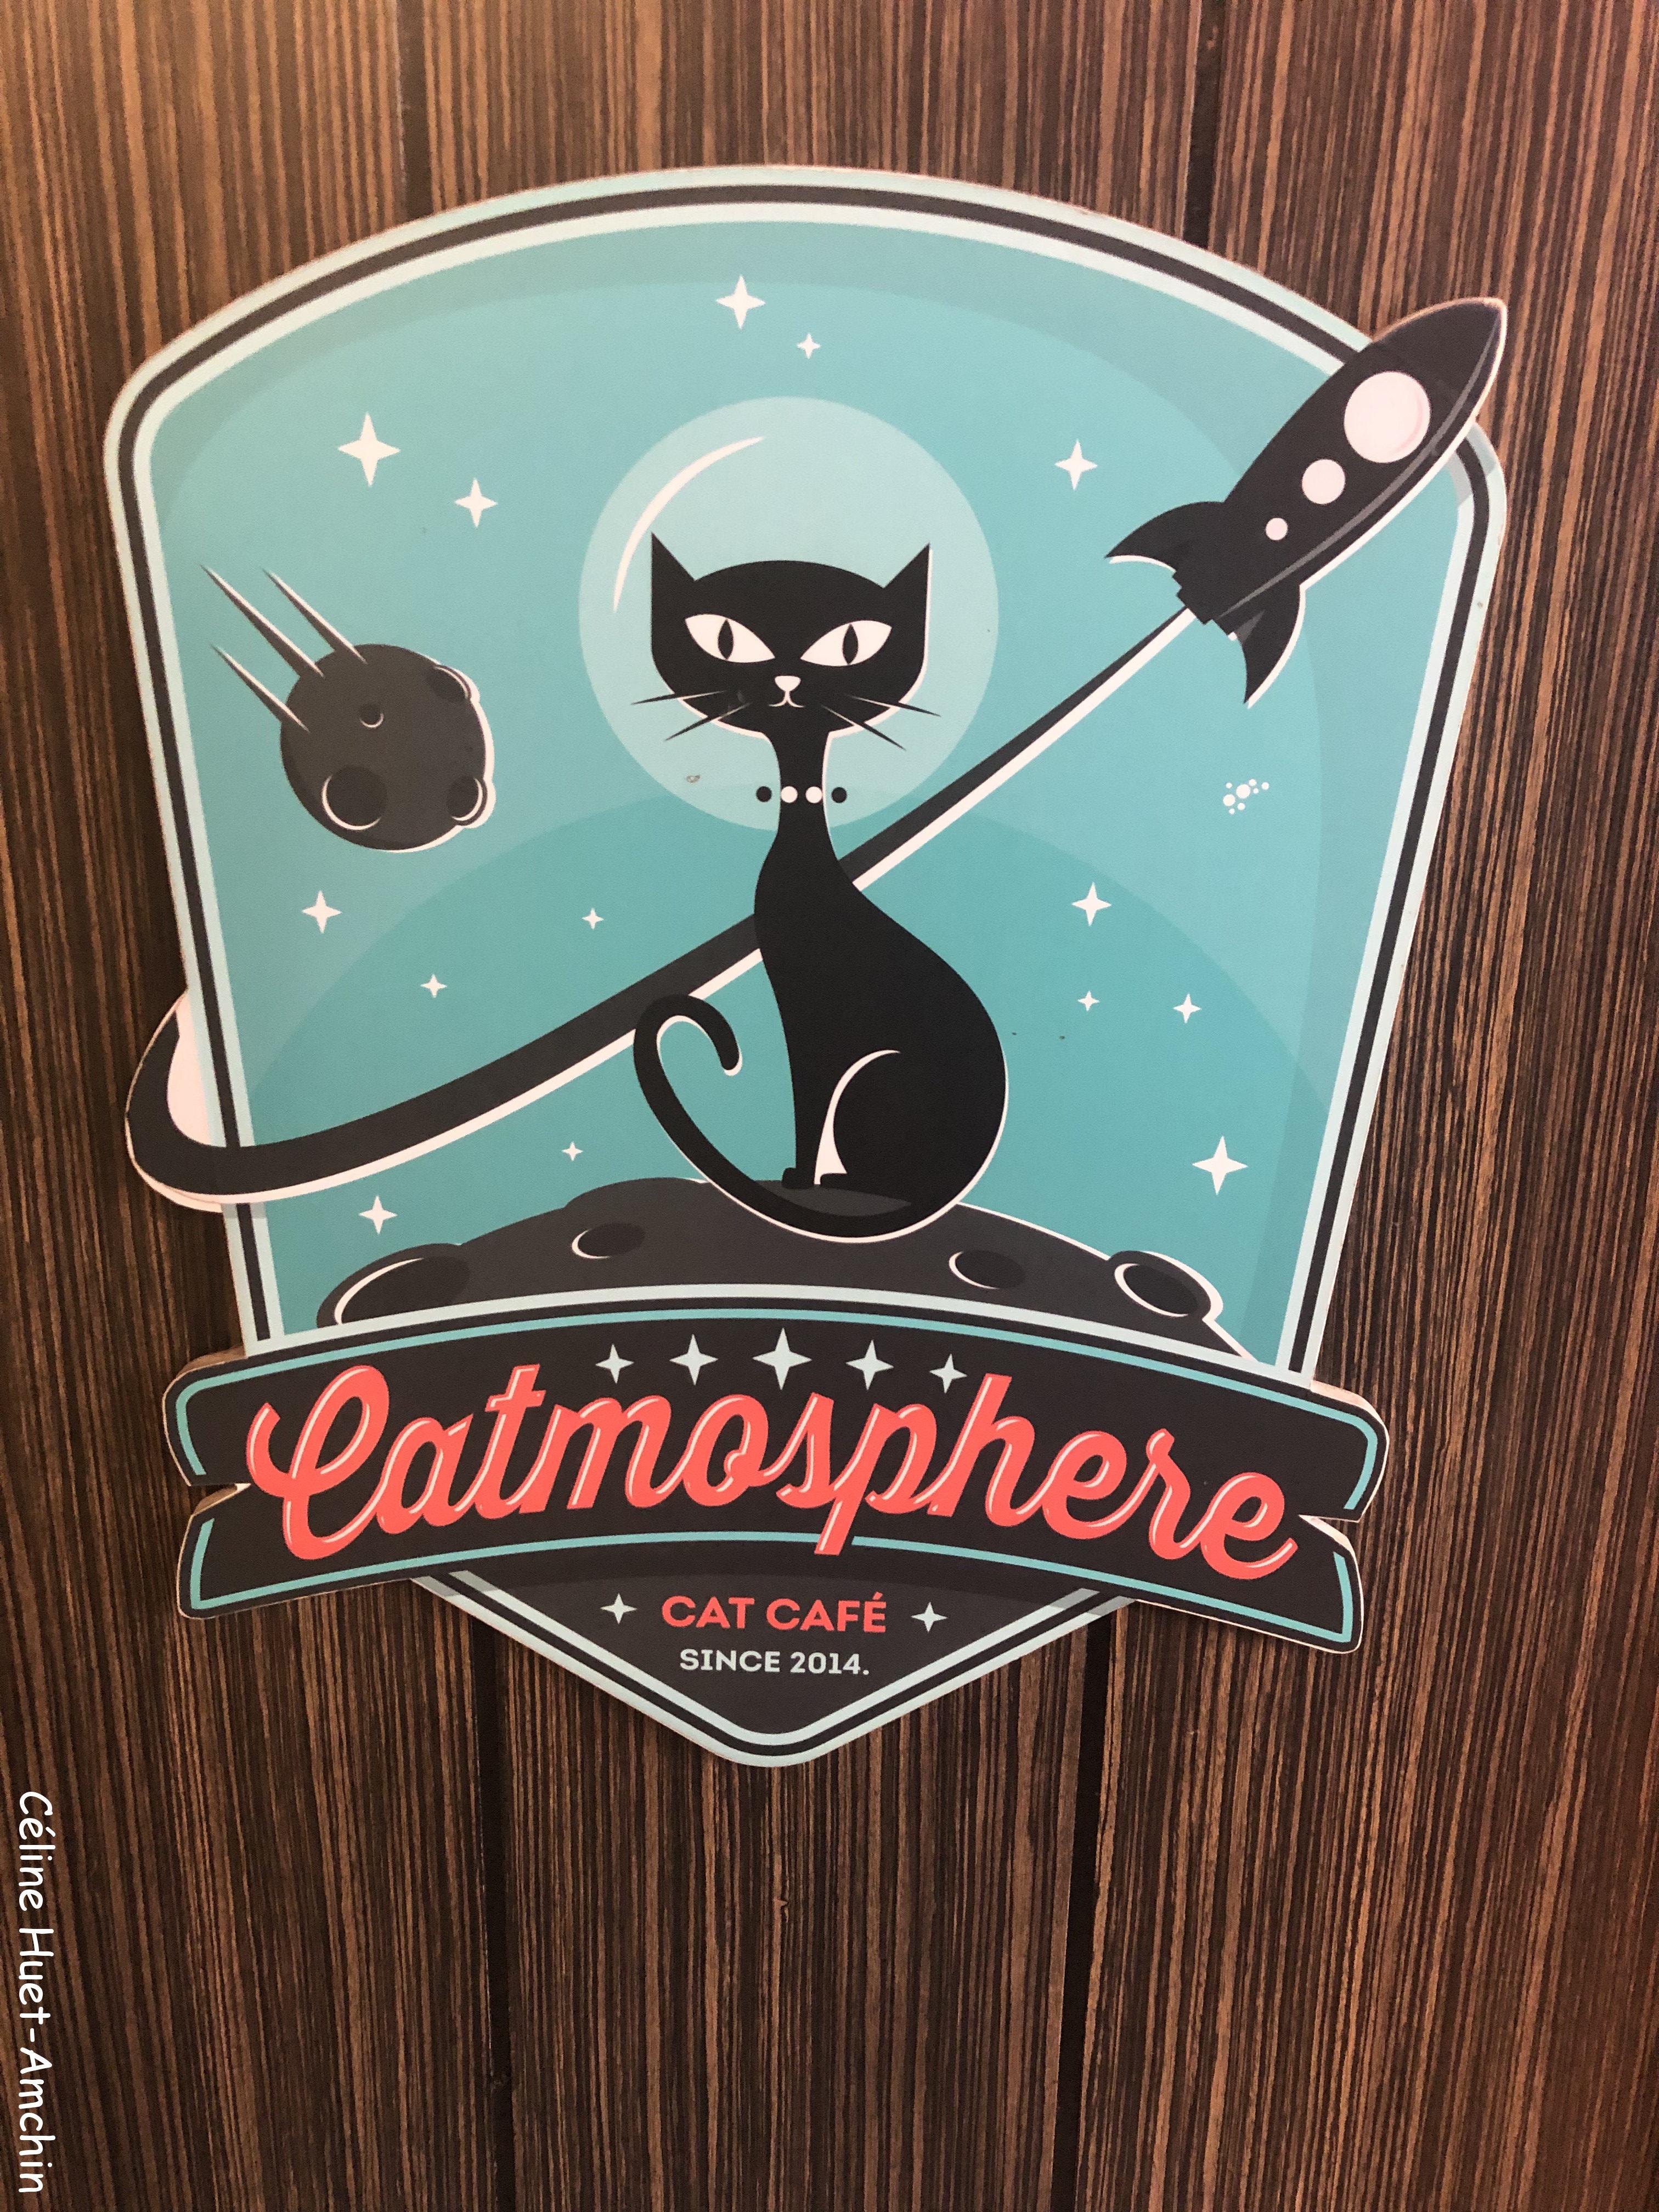 Catmosphère Cat Café Chiang Mai Thaïlande Asie